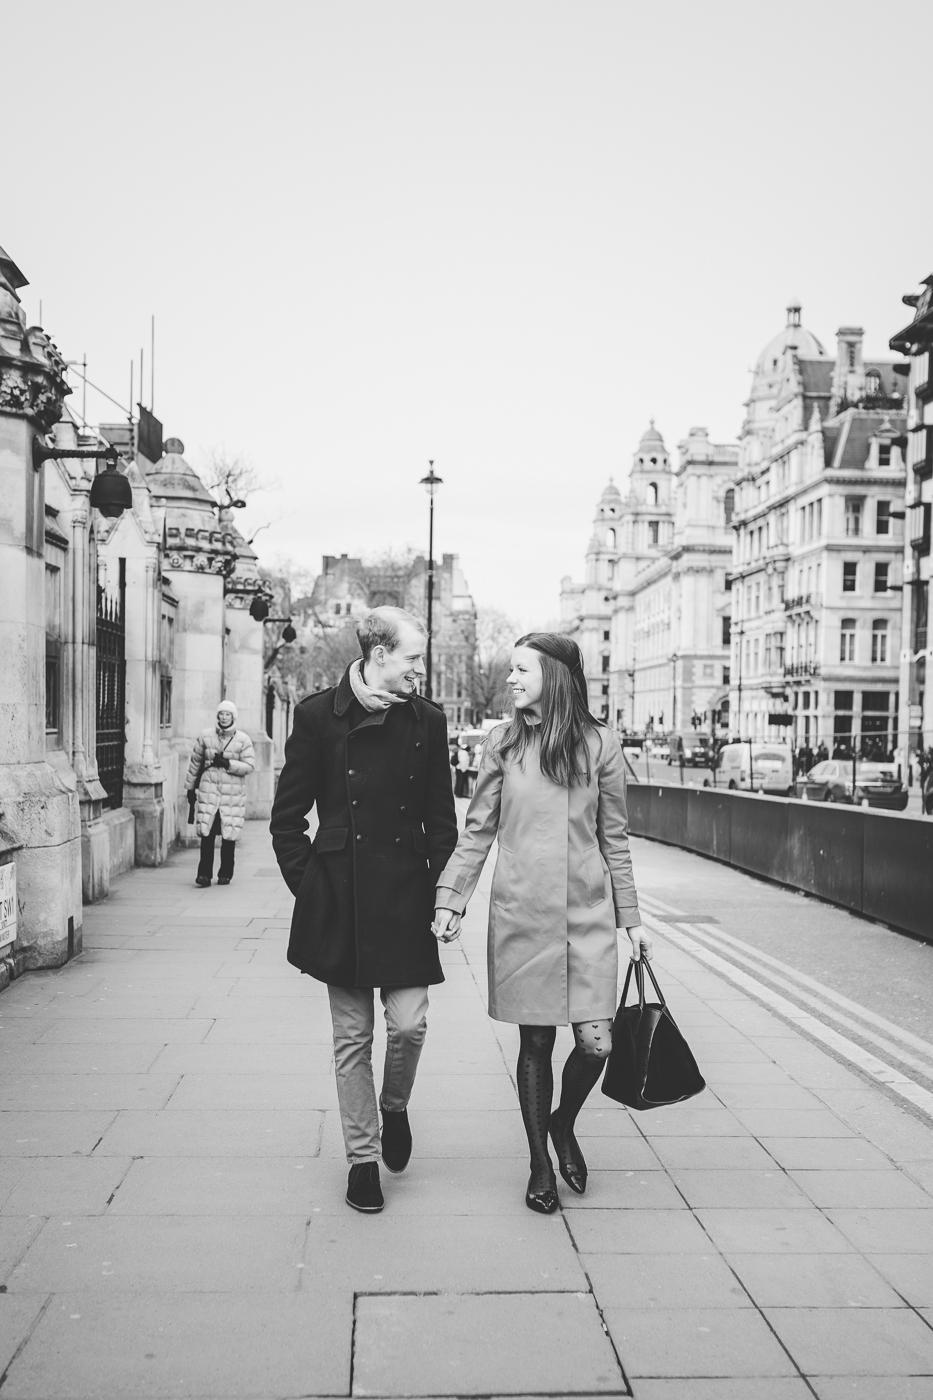 london-wedding-photographer-kate-gray-7.jpg